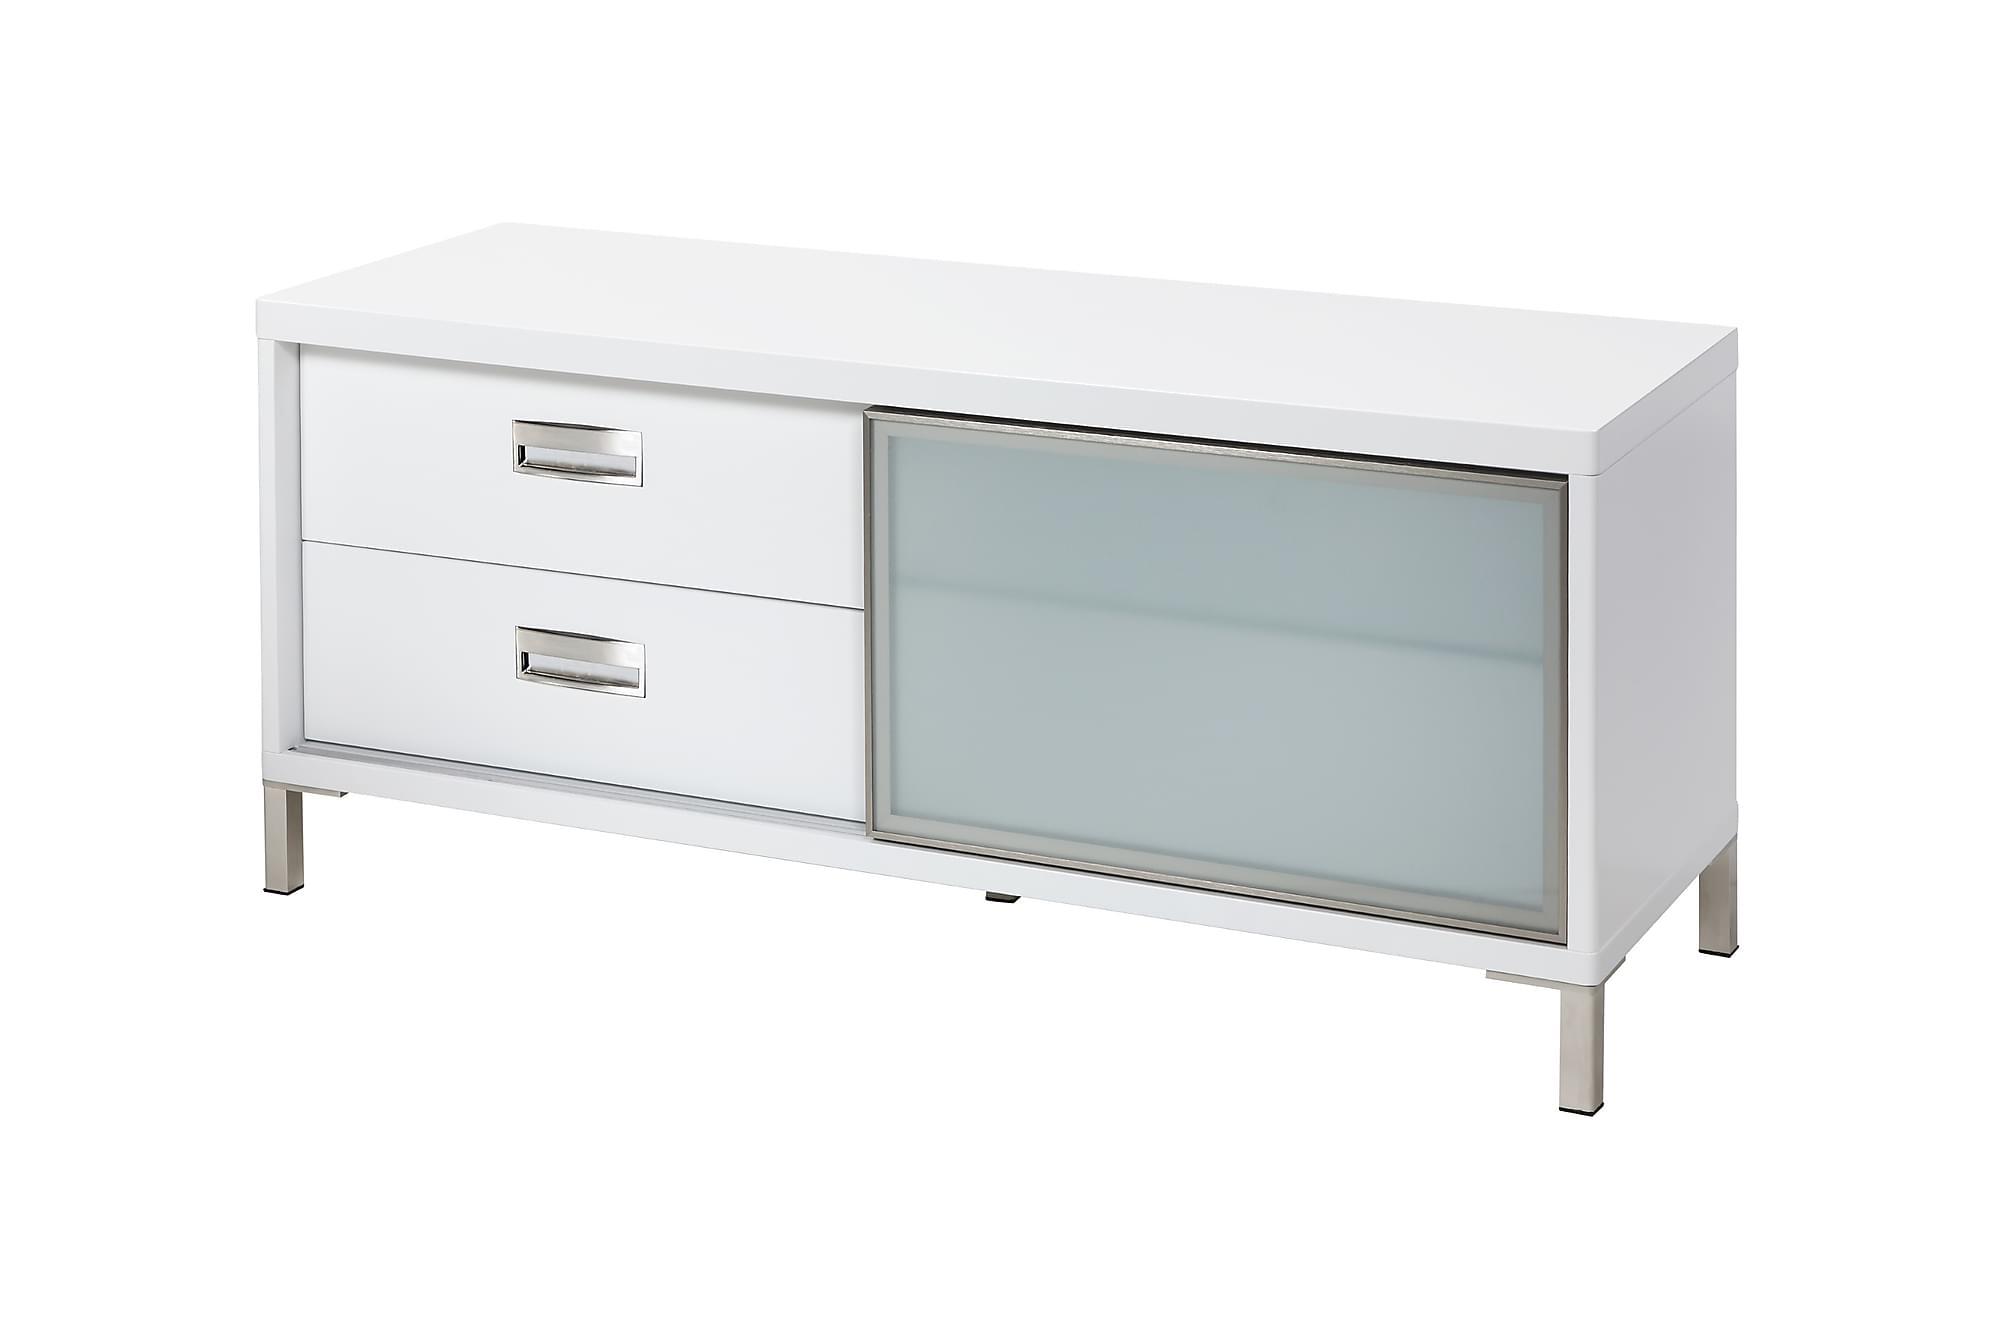 tv taso marie mattavalkoinen. Black Bedroom Furniture Sets. Home Design Ideas